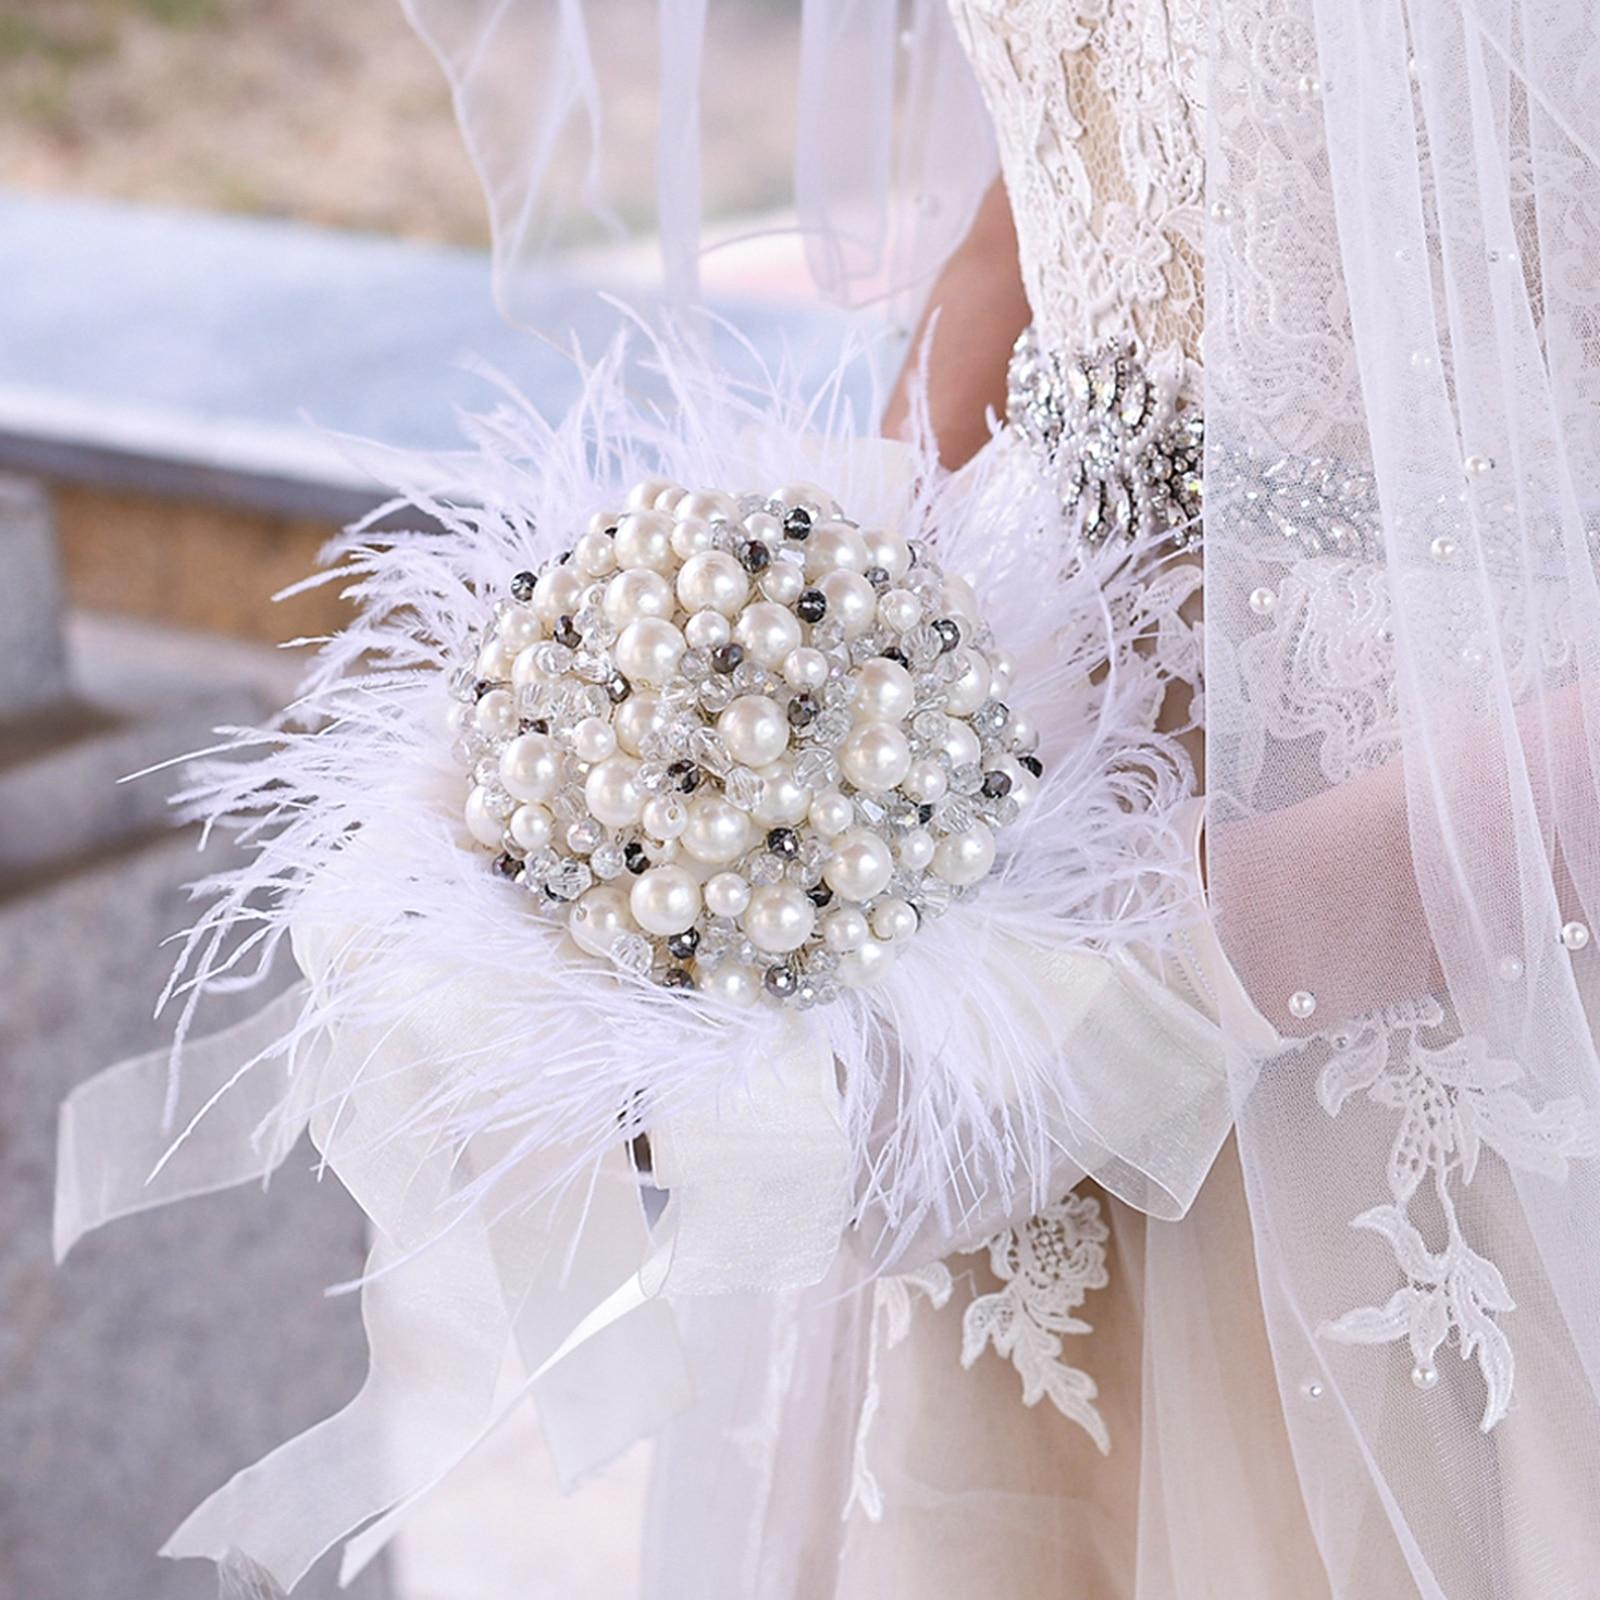 Wedding Bouquets For Bride Wedding Flower Bridal Bouquet Bridesmaid Bouquet Flowers Pearl Rhinestone Feather Bouquet Bridal недорого